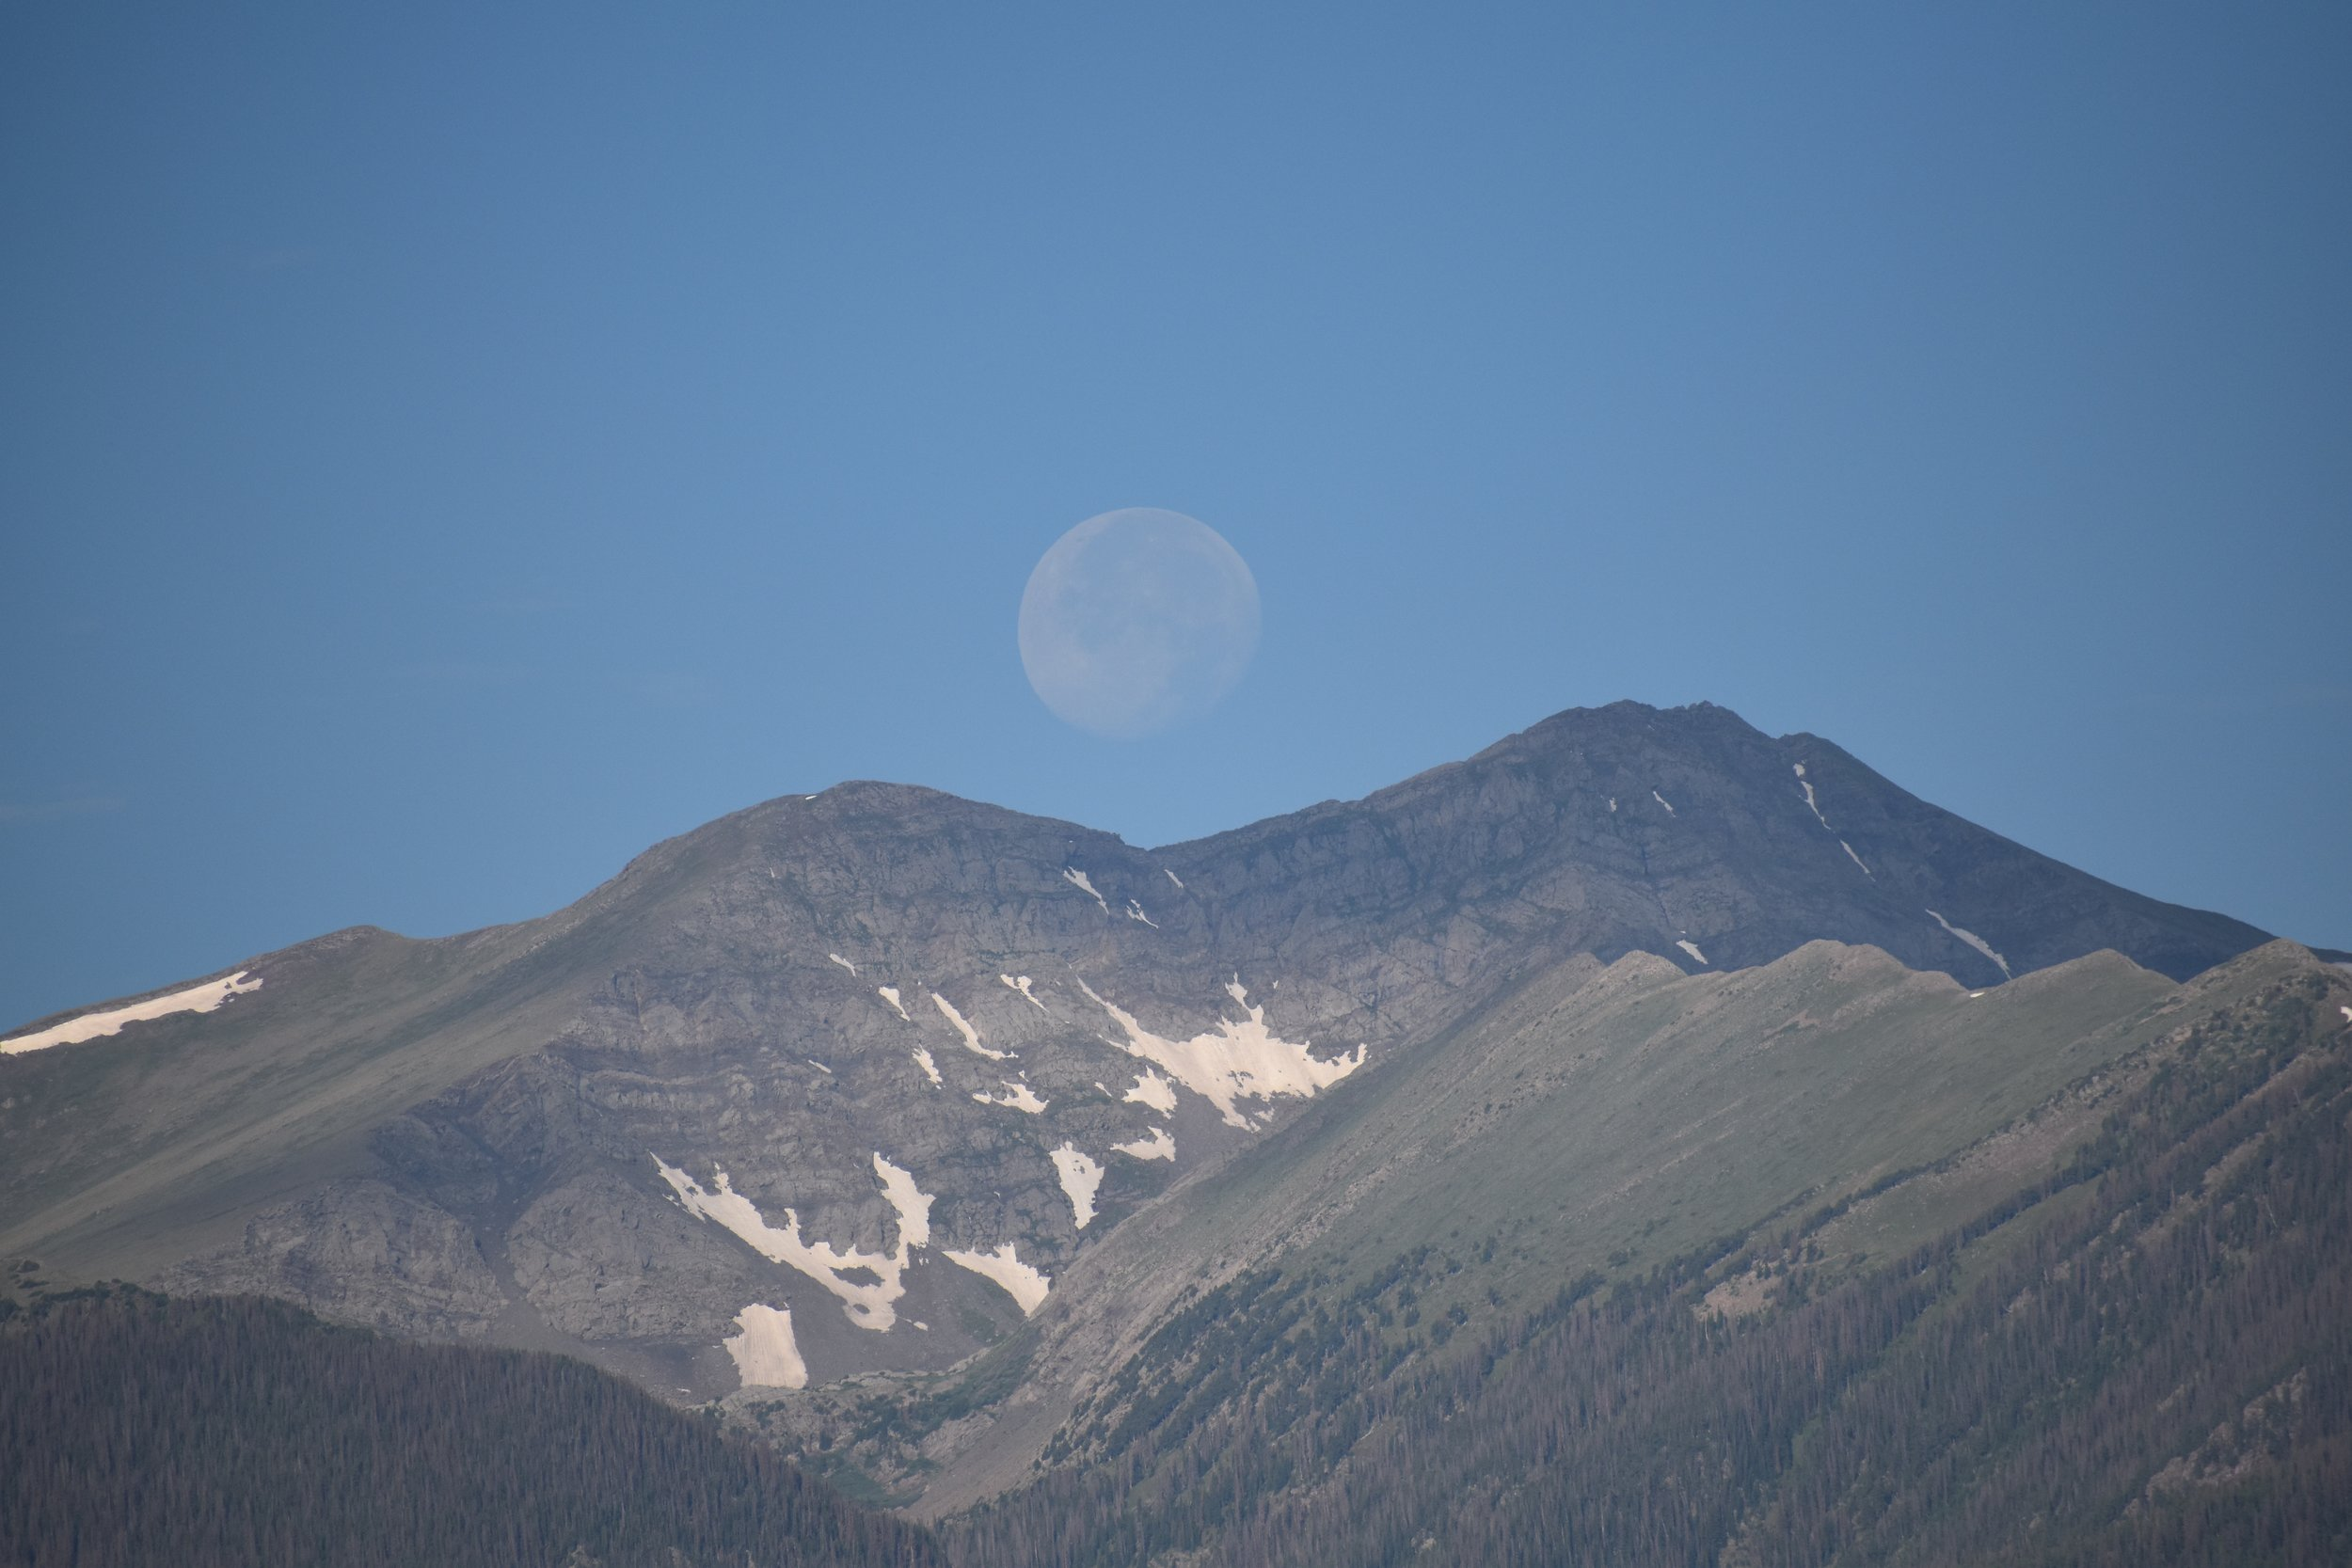 westcliffe-mountain-moon-rise.jpg